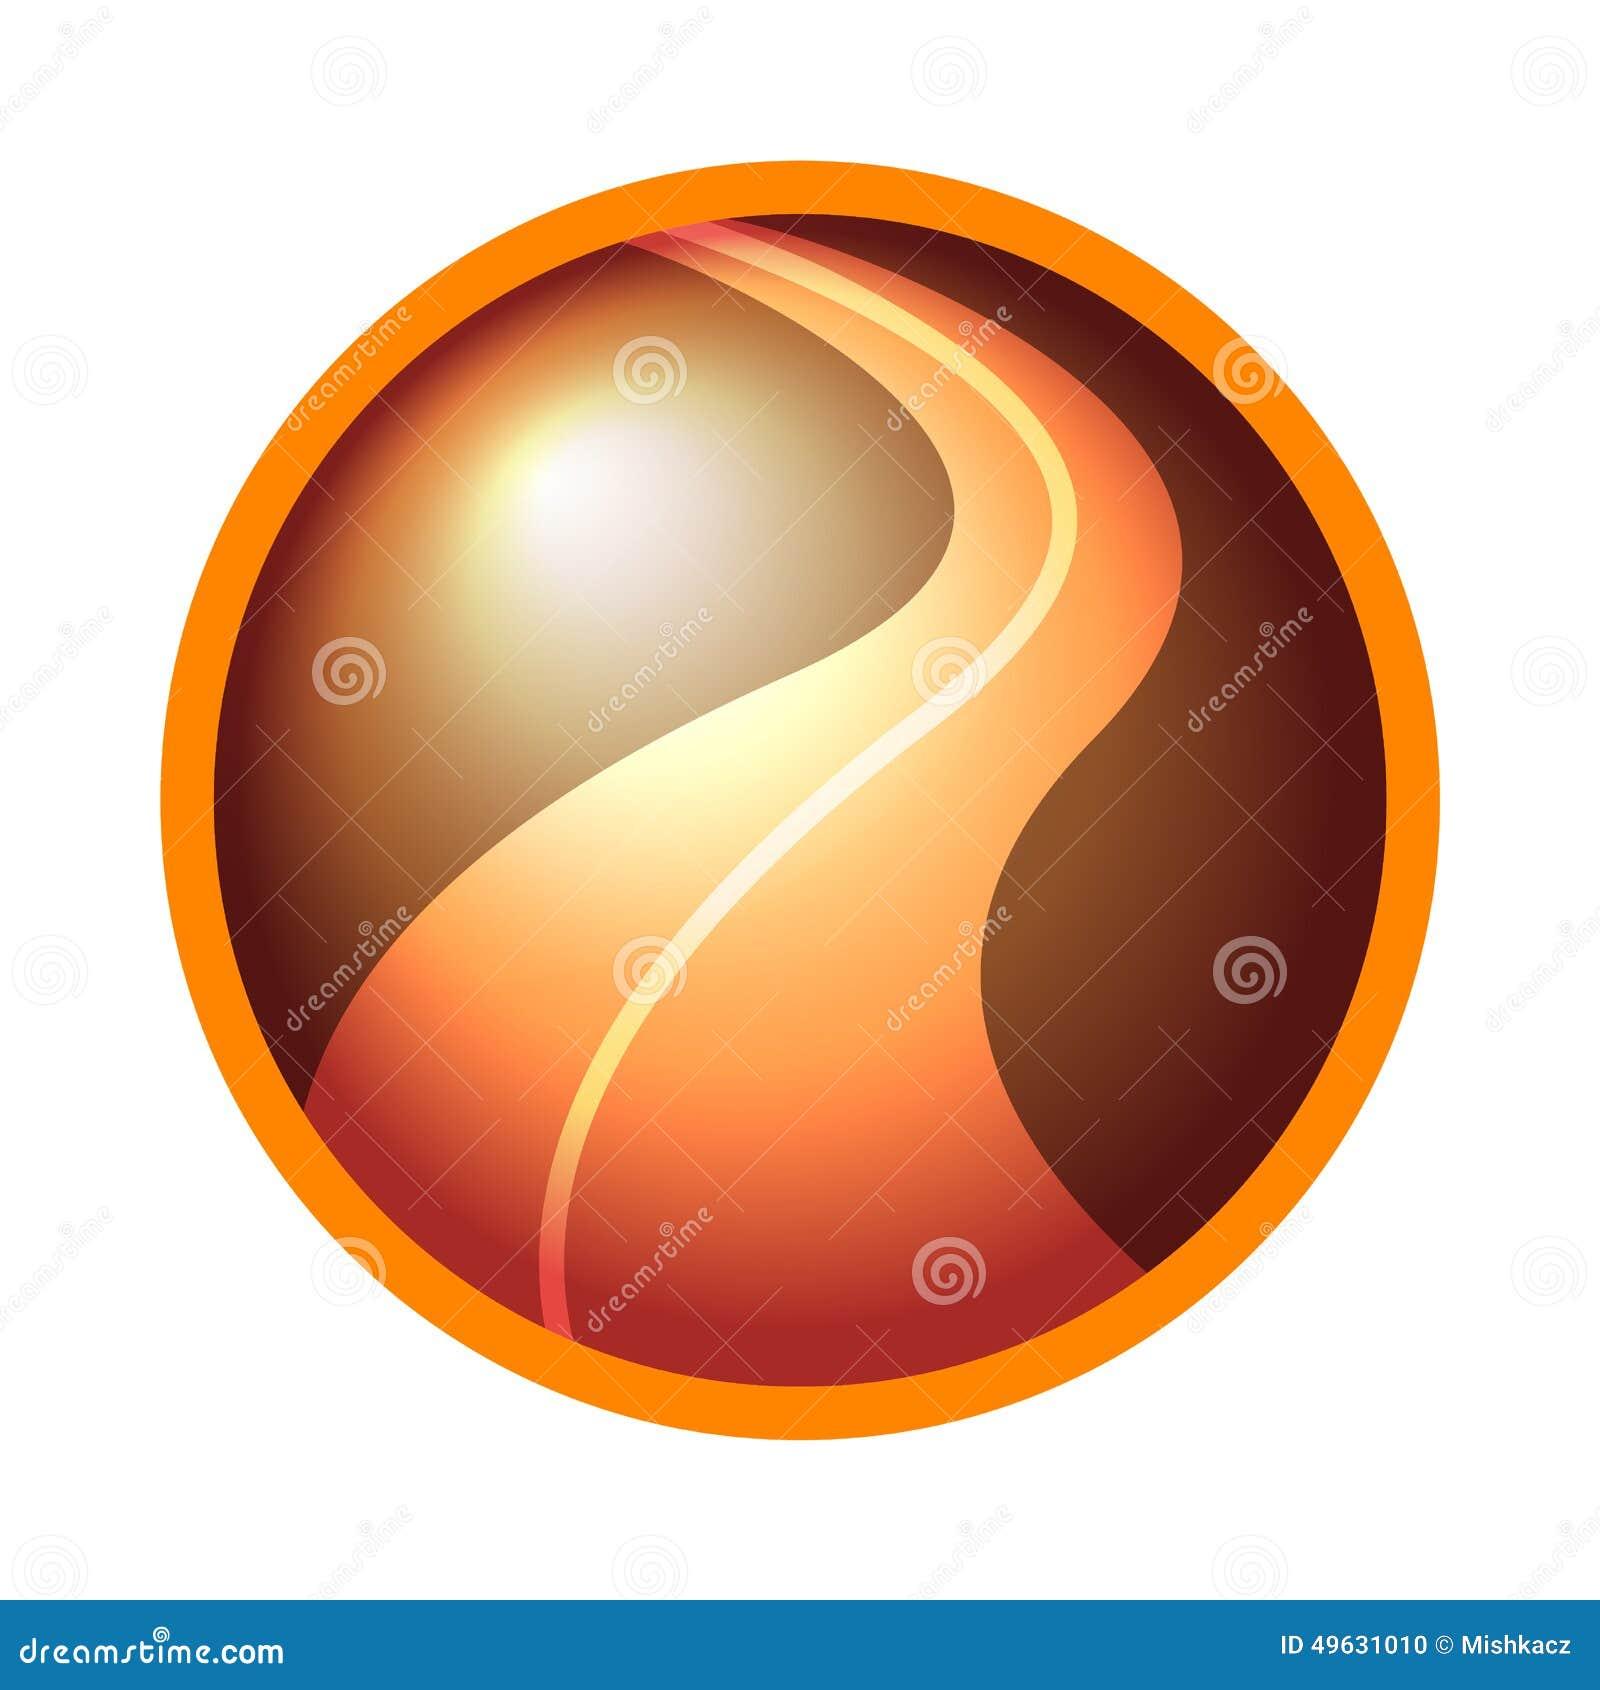 Road Logo Icon Stock Illustration - Image: 49631010